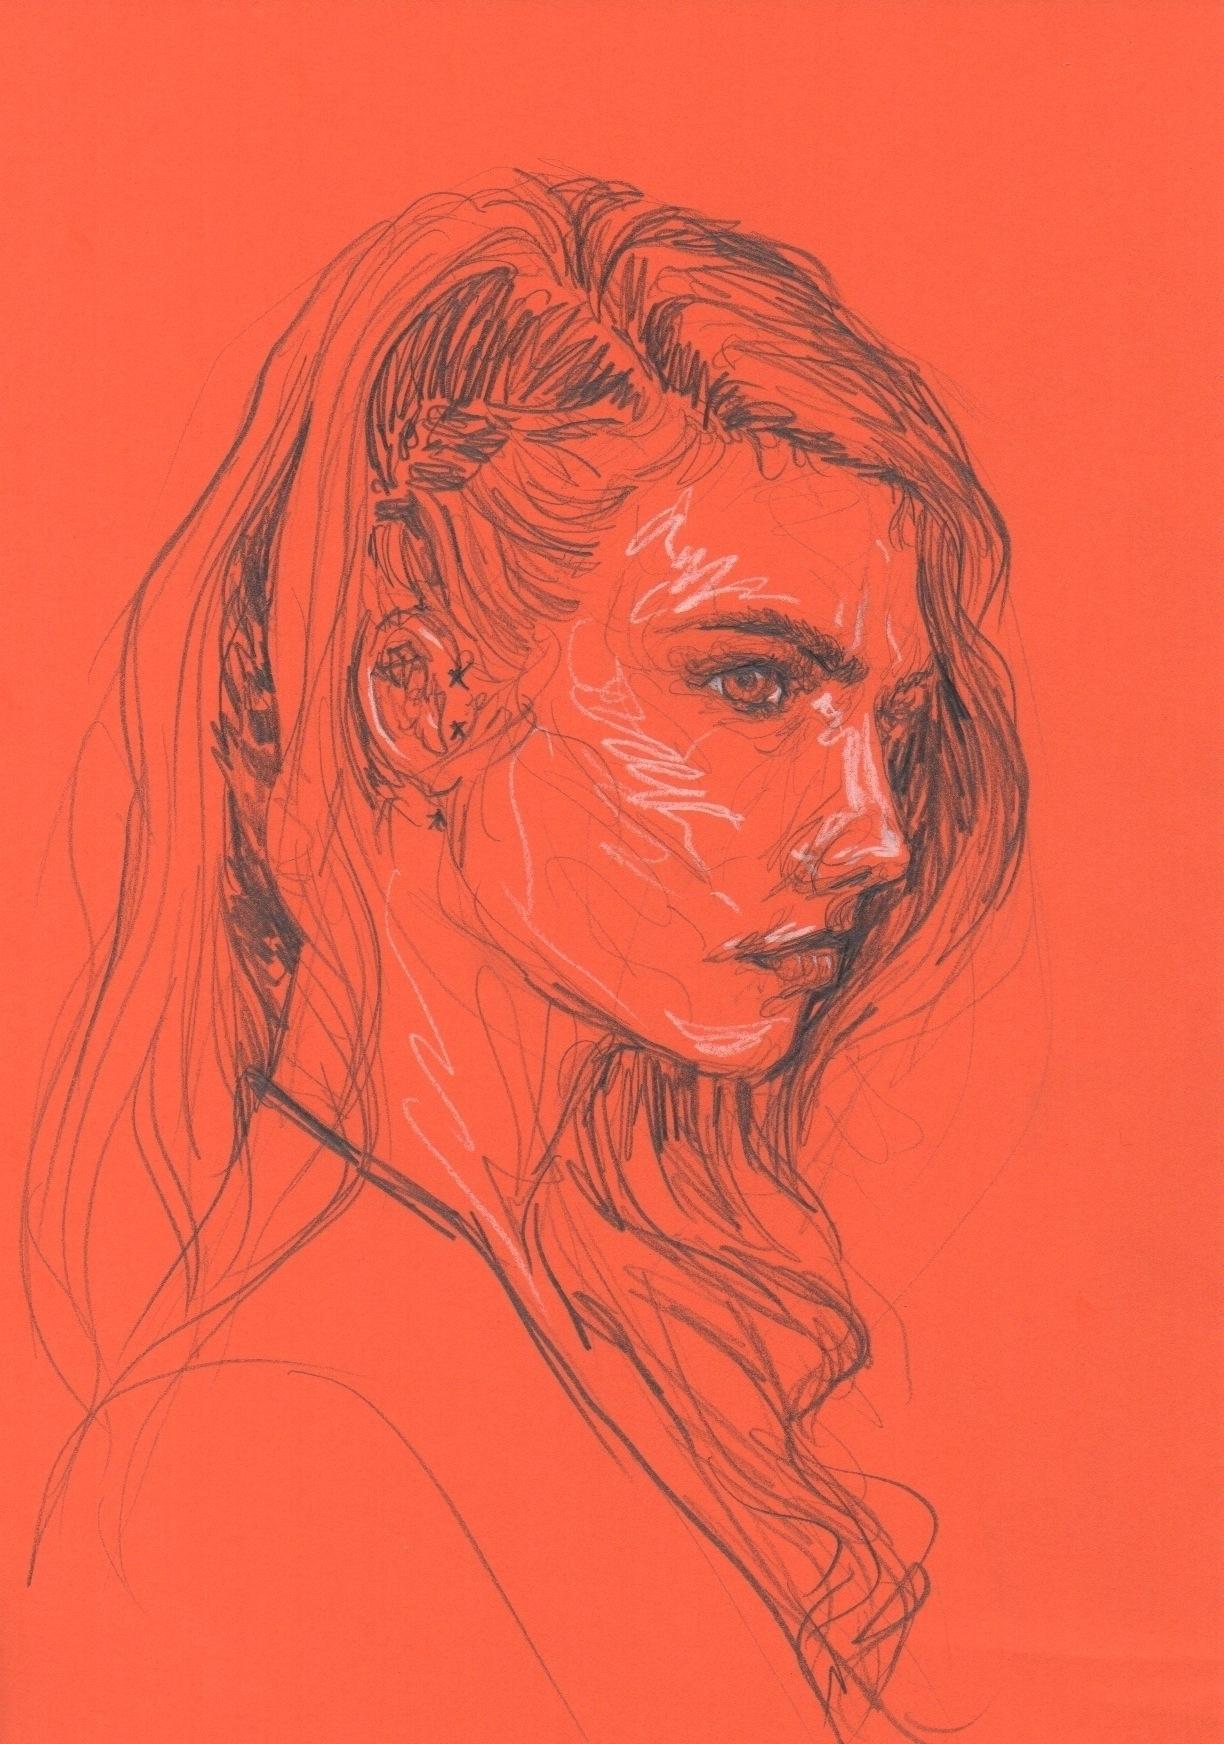 Cara - illustration, drawing, sketch - juichenhu | ello